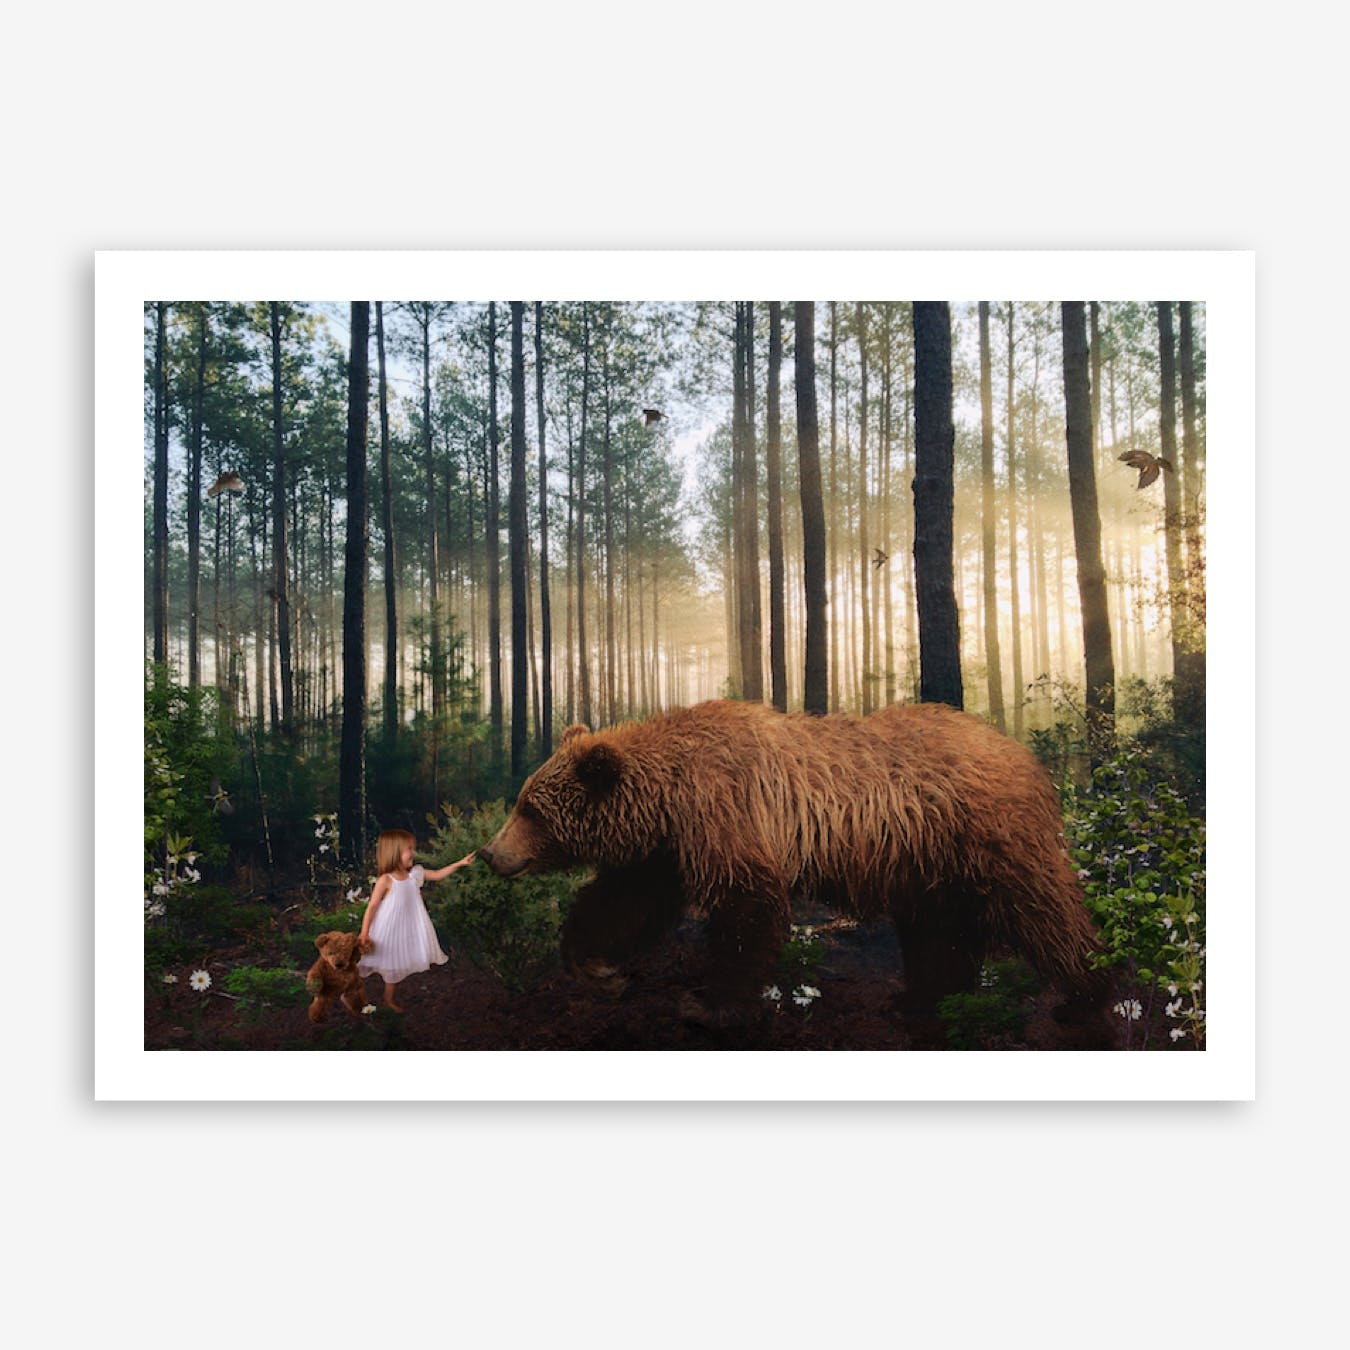 Winnie in the Woods